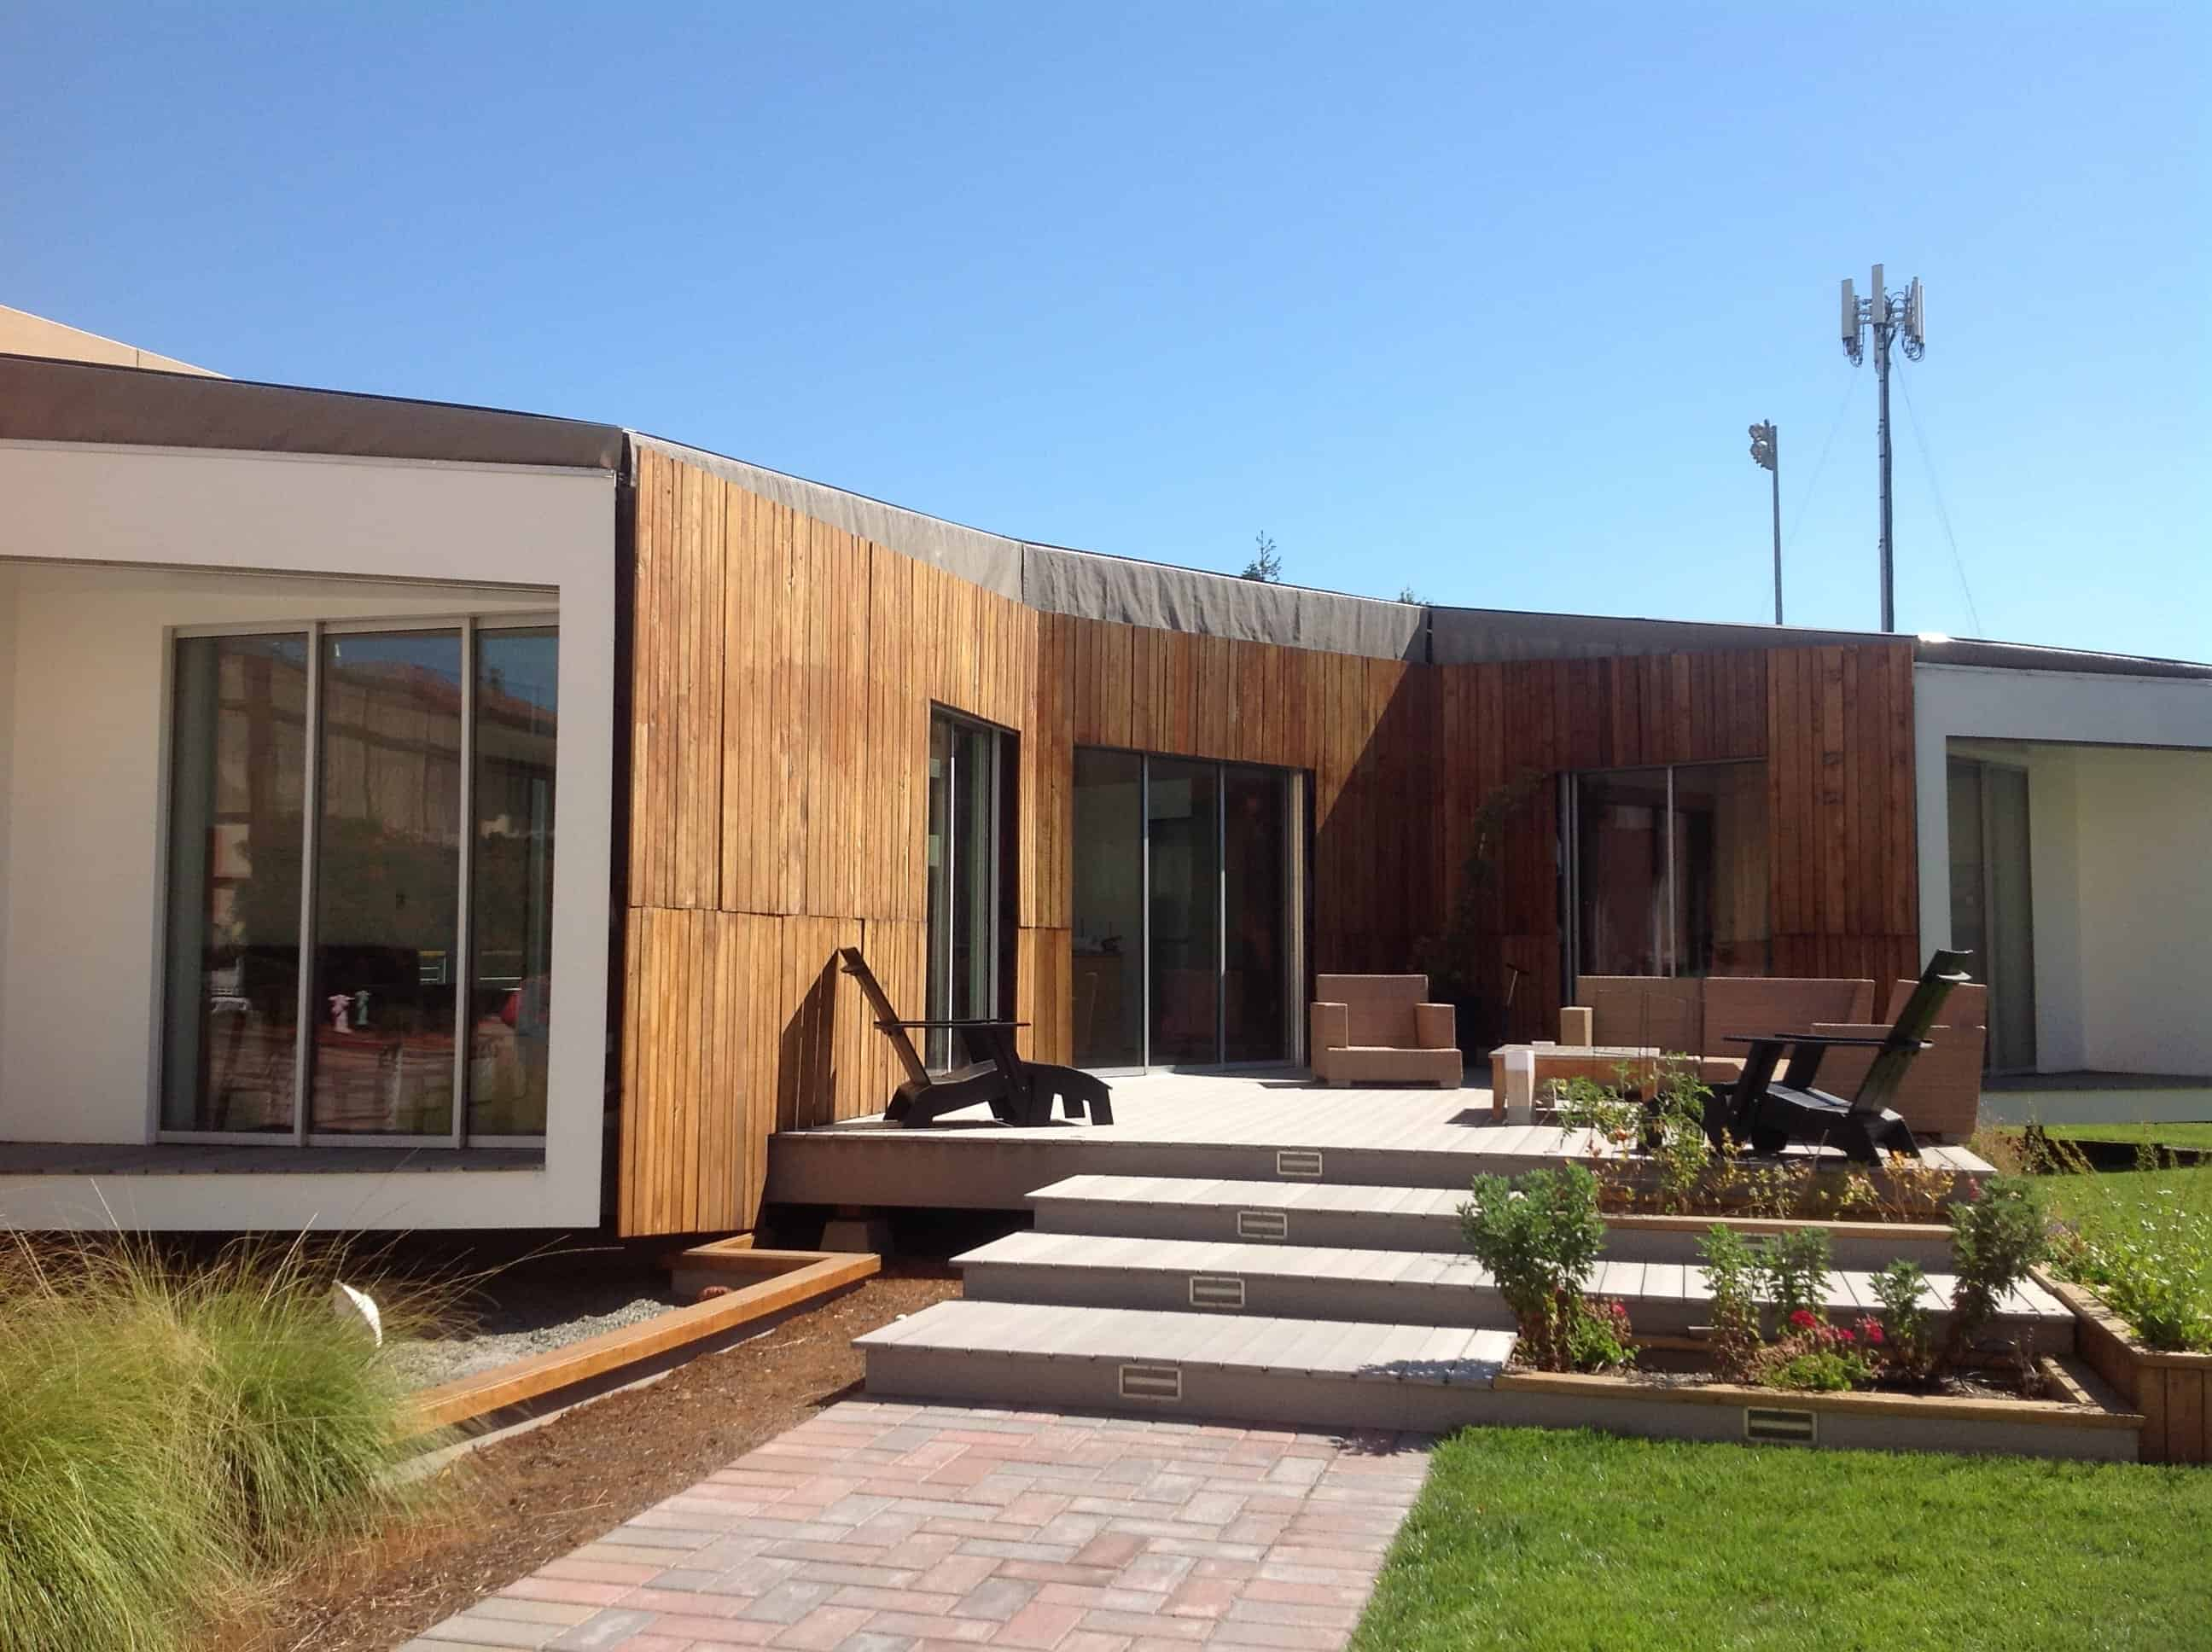 santa clara university magellan college counseling scu solar decathlon house